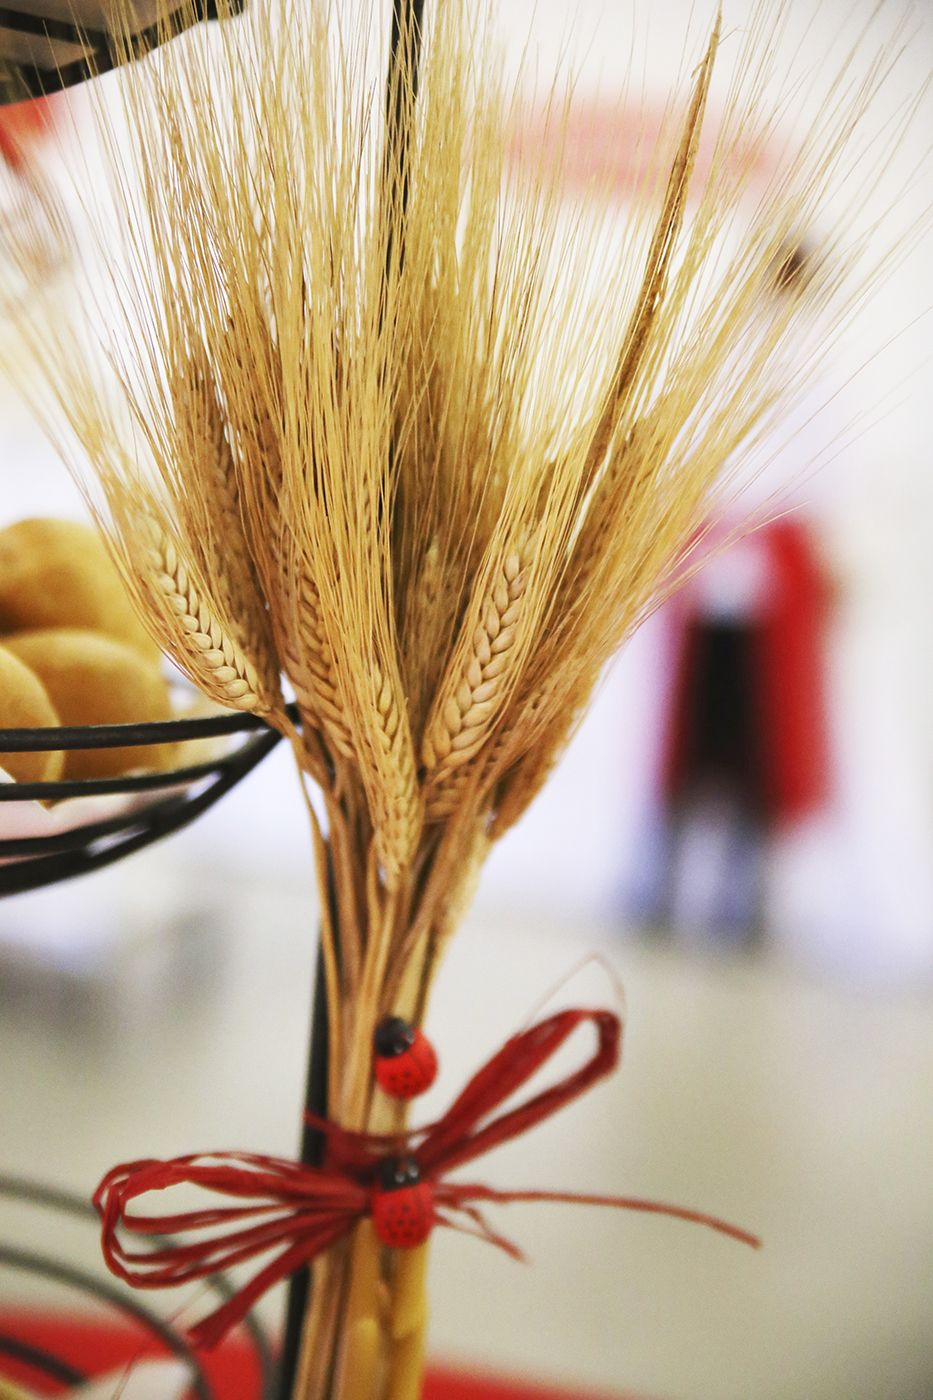 Wheat. #food #pasta #italy #photo